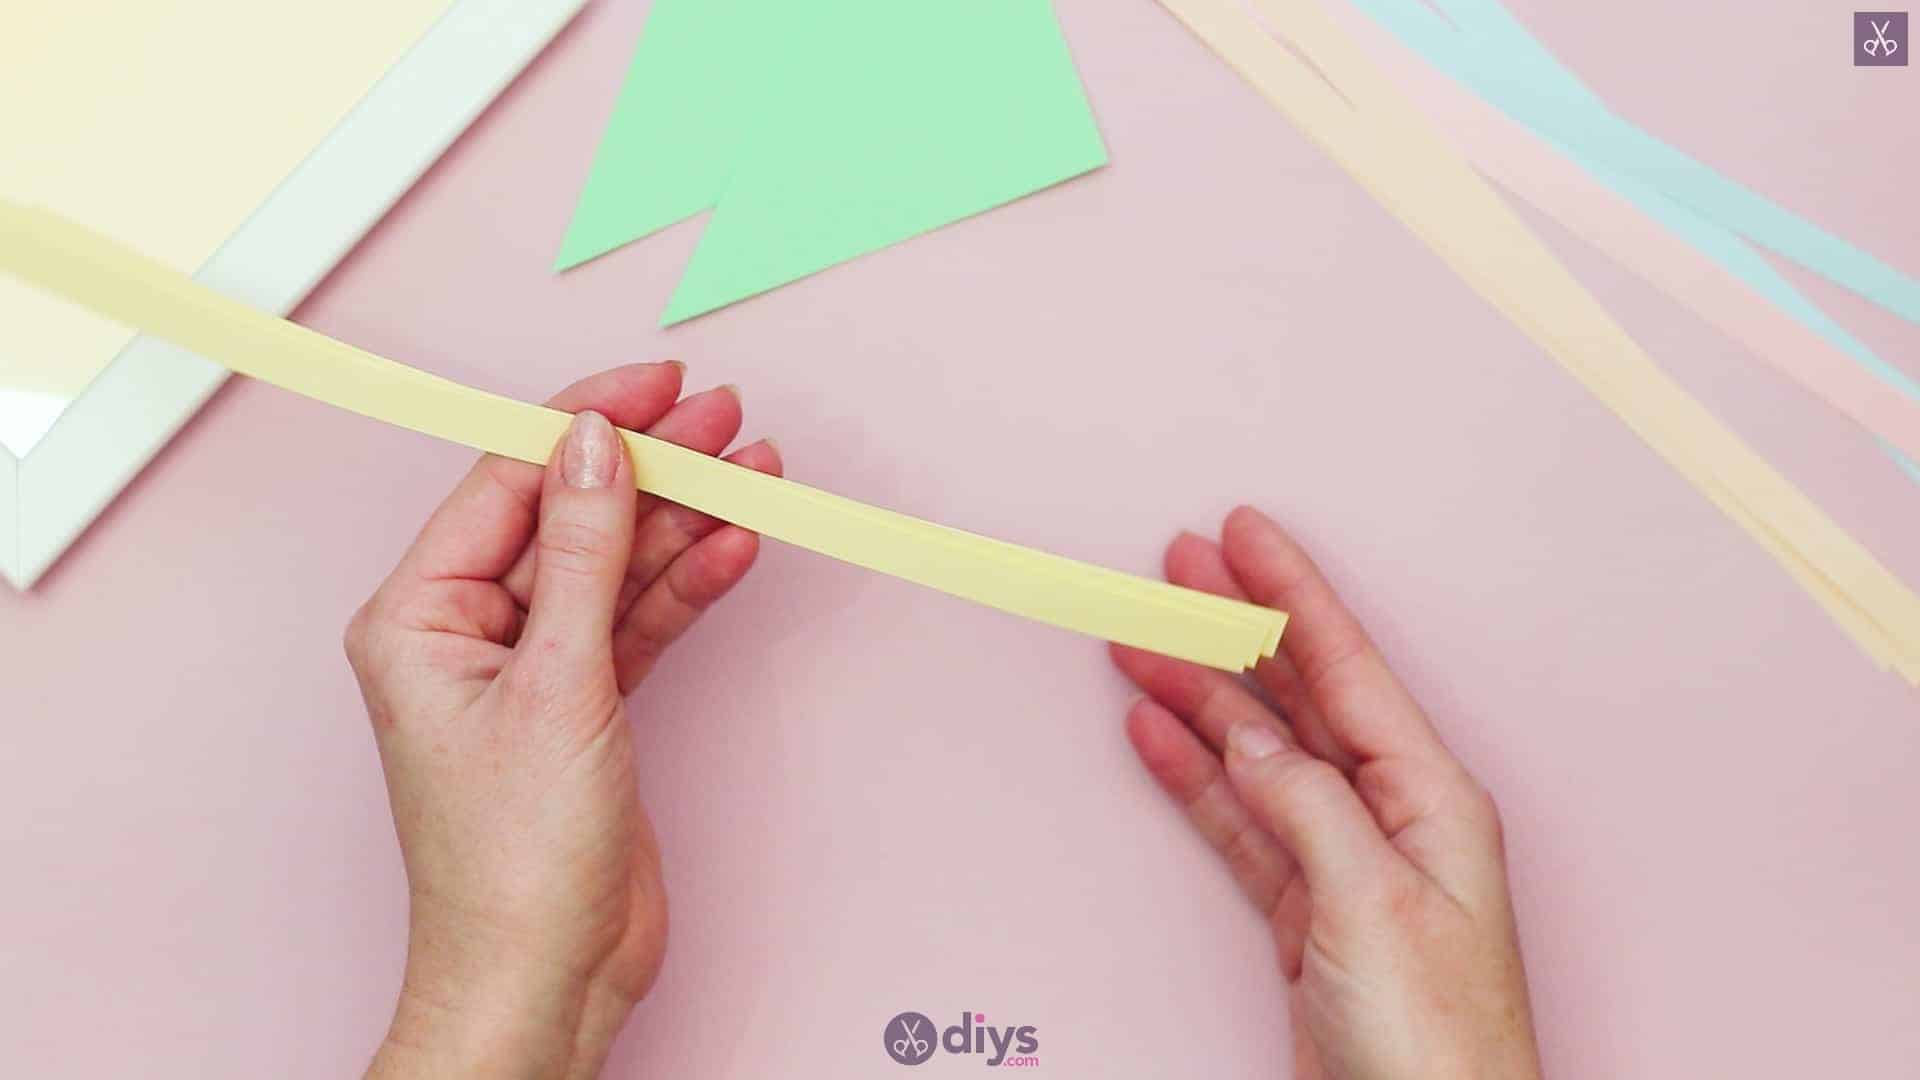 Diy origami flower art step 2a